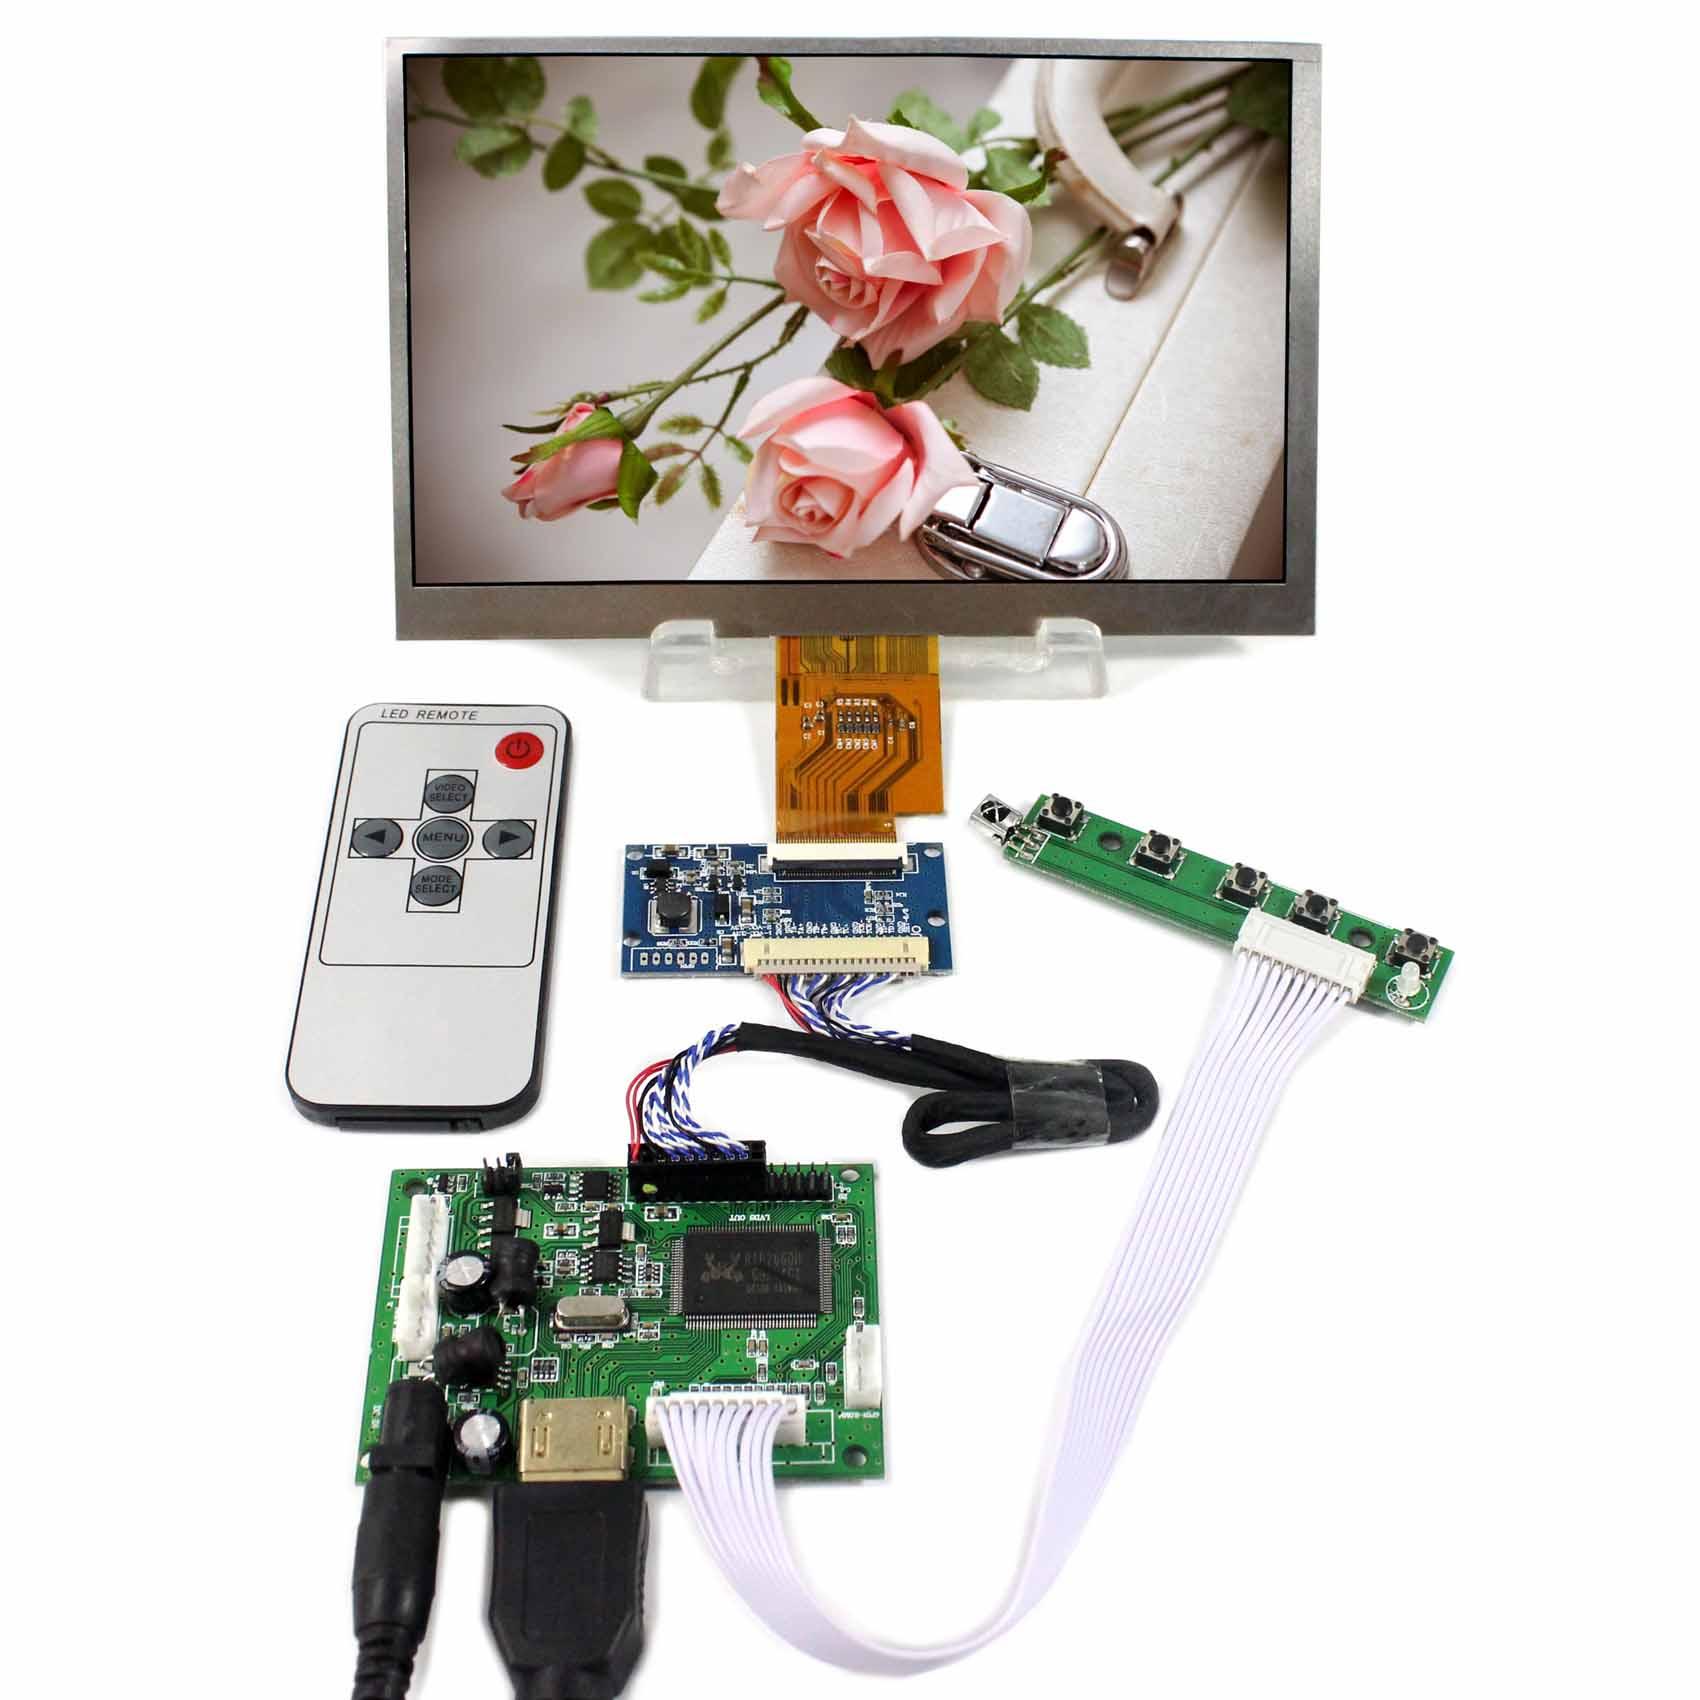 HDMI LCD Controller Board VS-TY2660H-V1 With 7inch 1024x600 AT070TNA2 LCD Screen vga 2av reversing lcd controller board with 7inch 1024x600 at070tna2 lcd screen